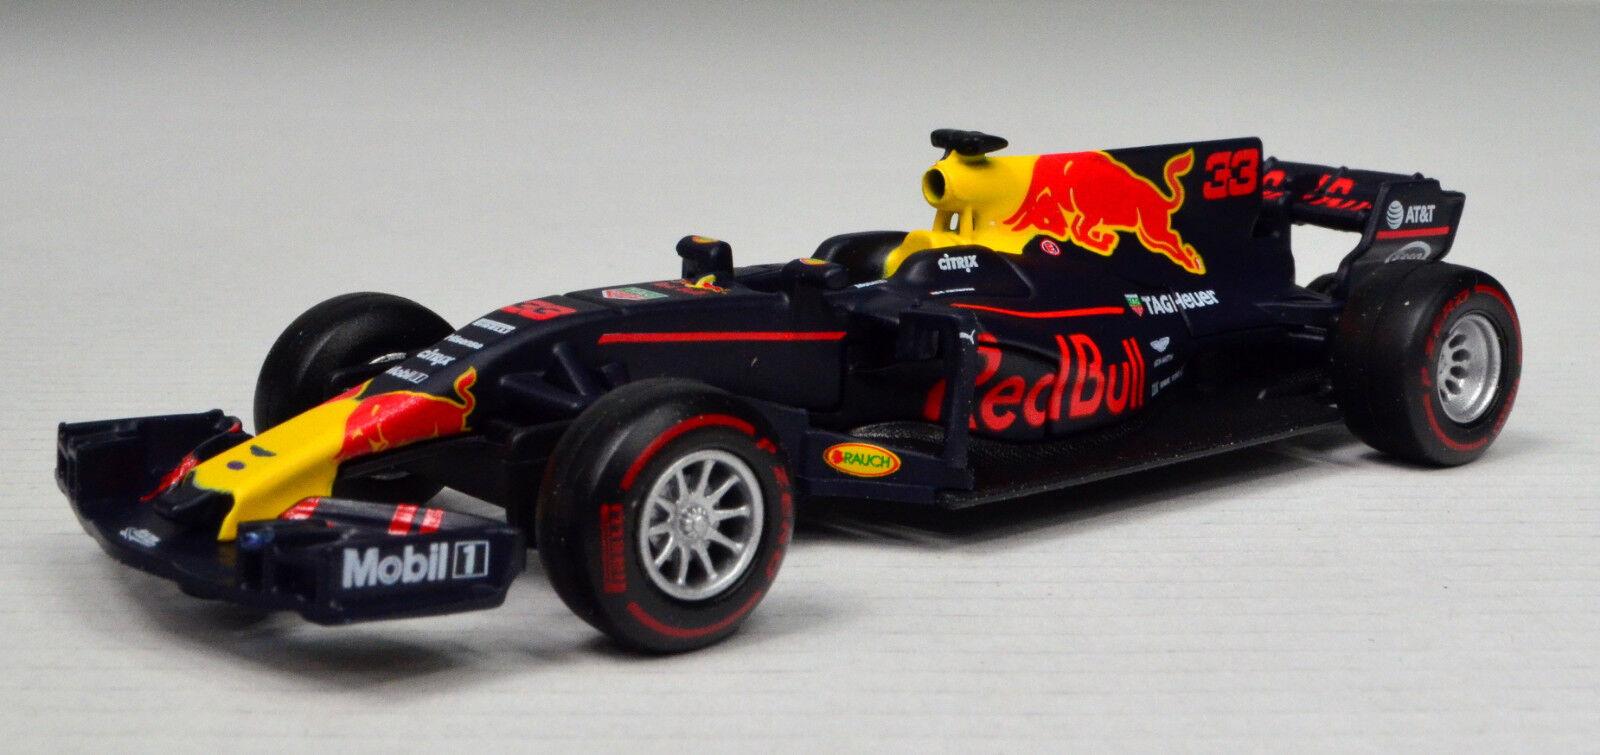 Tgold red Infinity RB13 H Max Verstappen Scala 1 43 Bburago